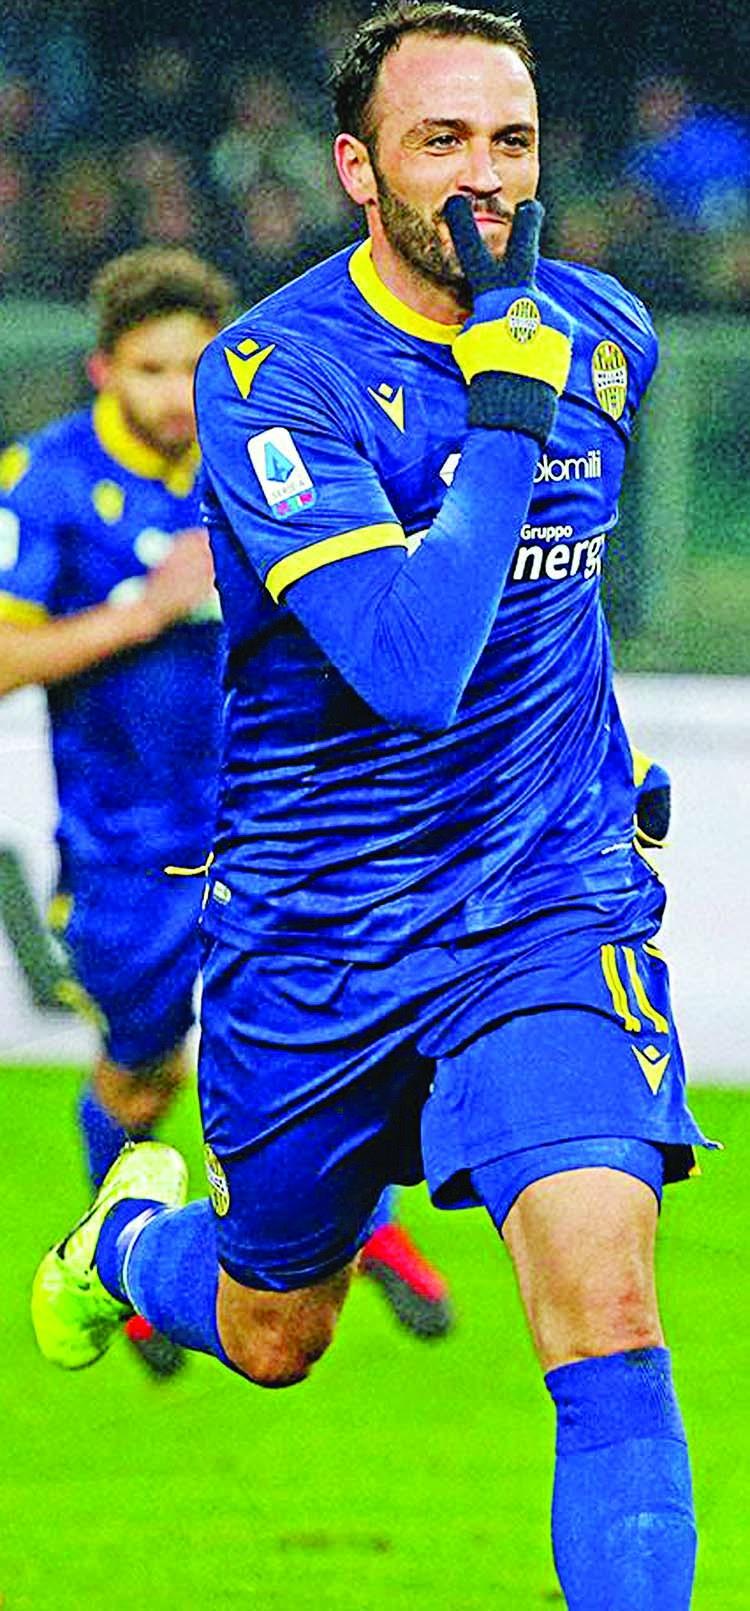 Verona shock Juve